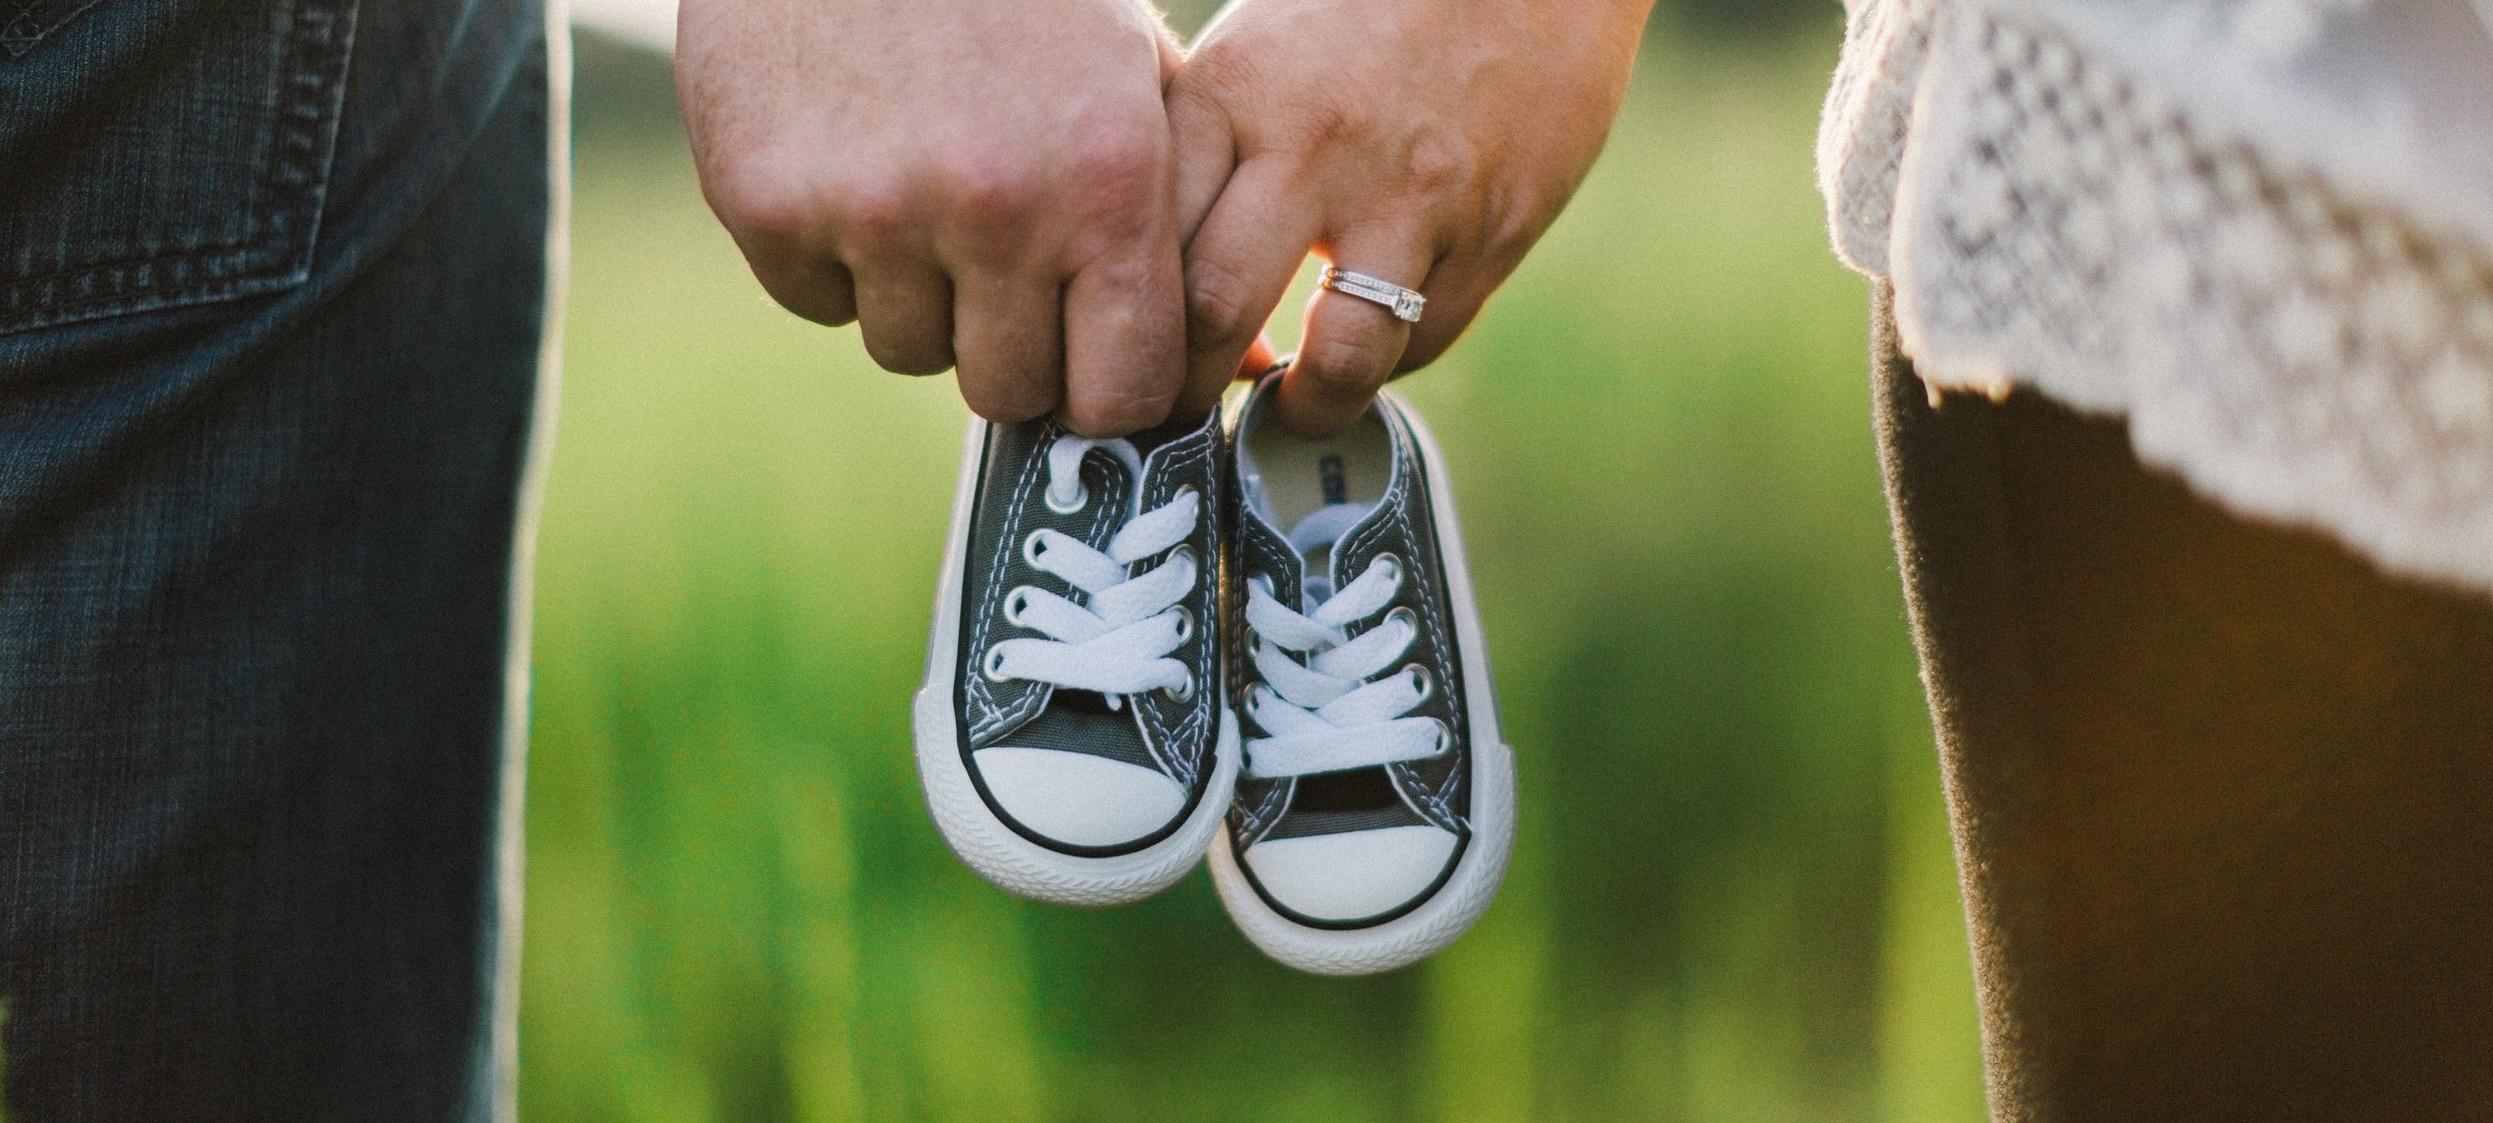 6 Healthy Pregnancy Myths - Busted!